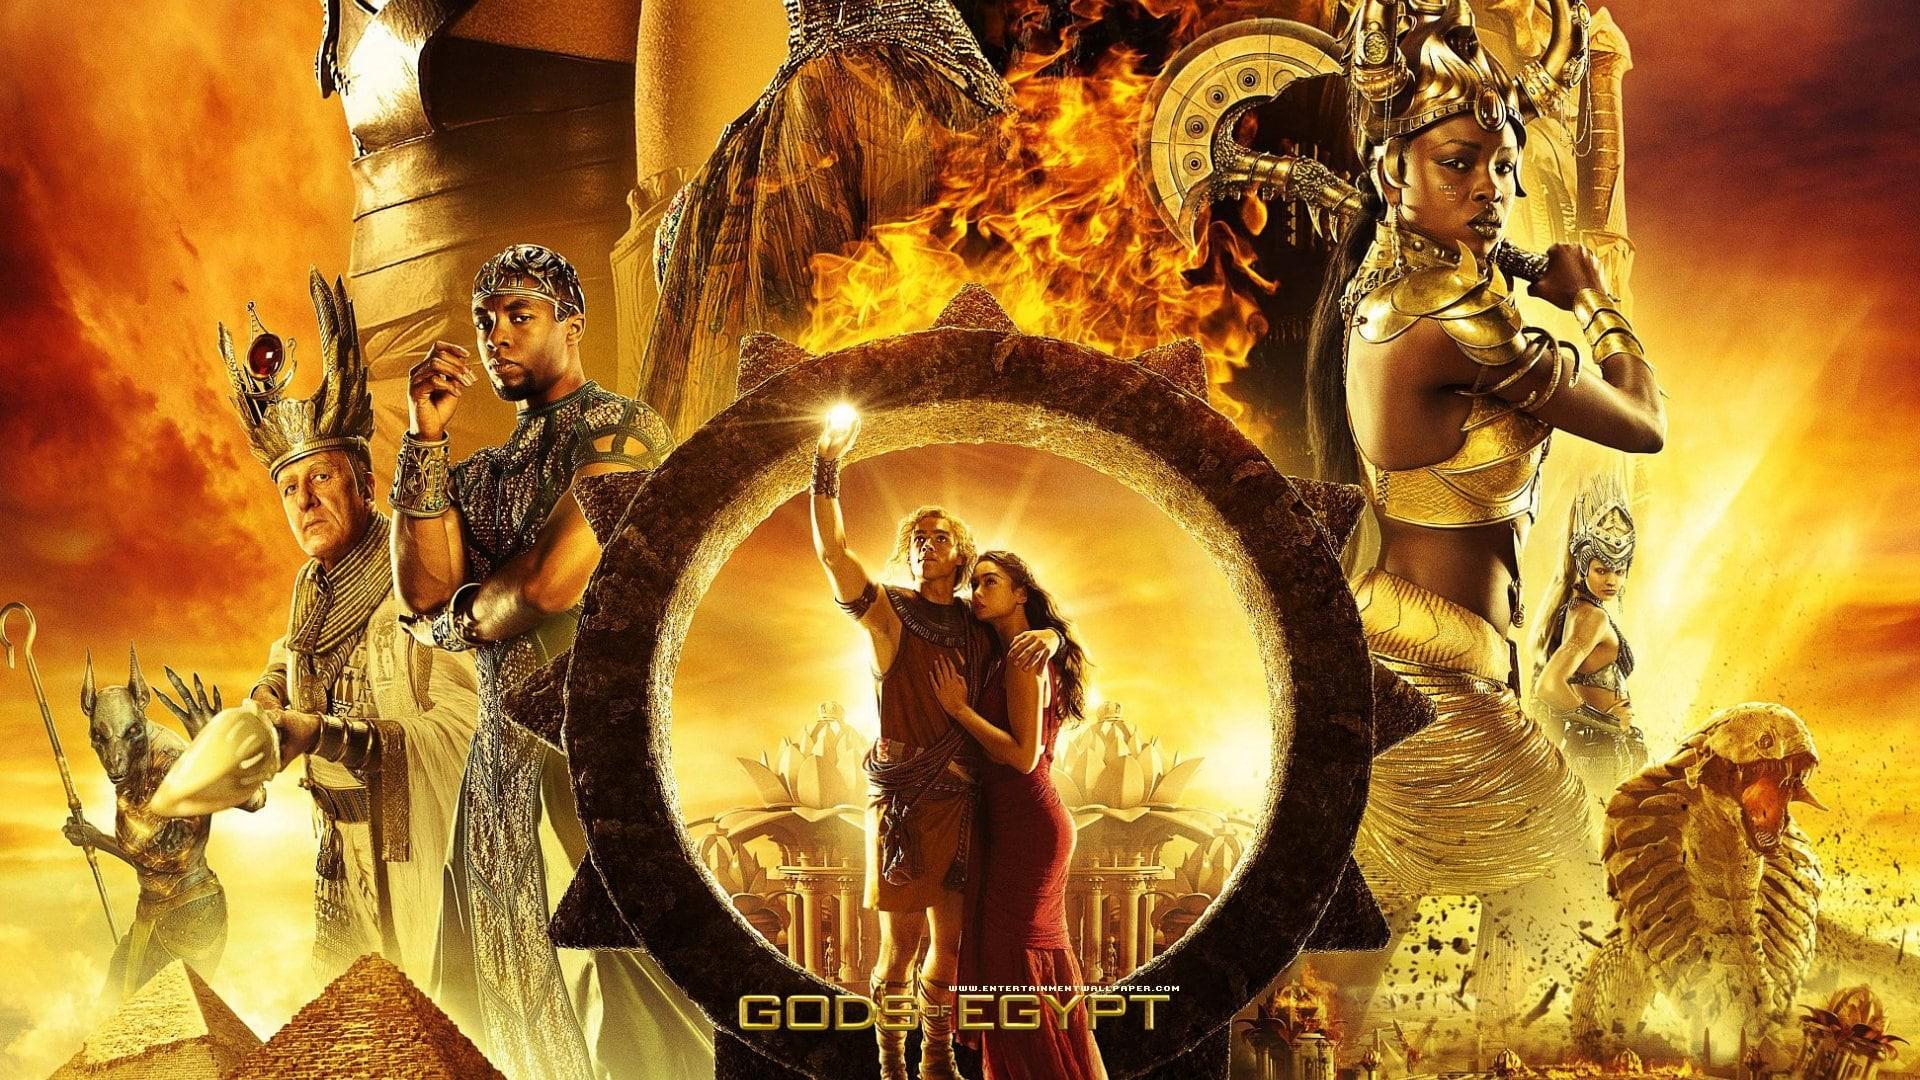 Gods of Egypt HD pics Gods of Egypt Wallpapers hd